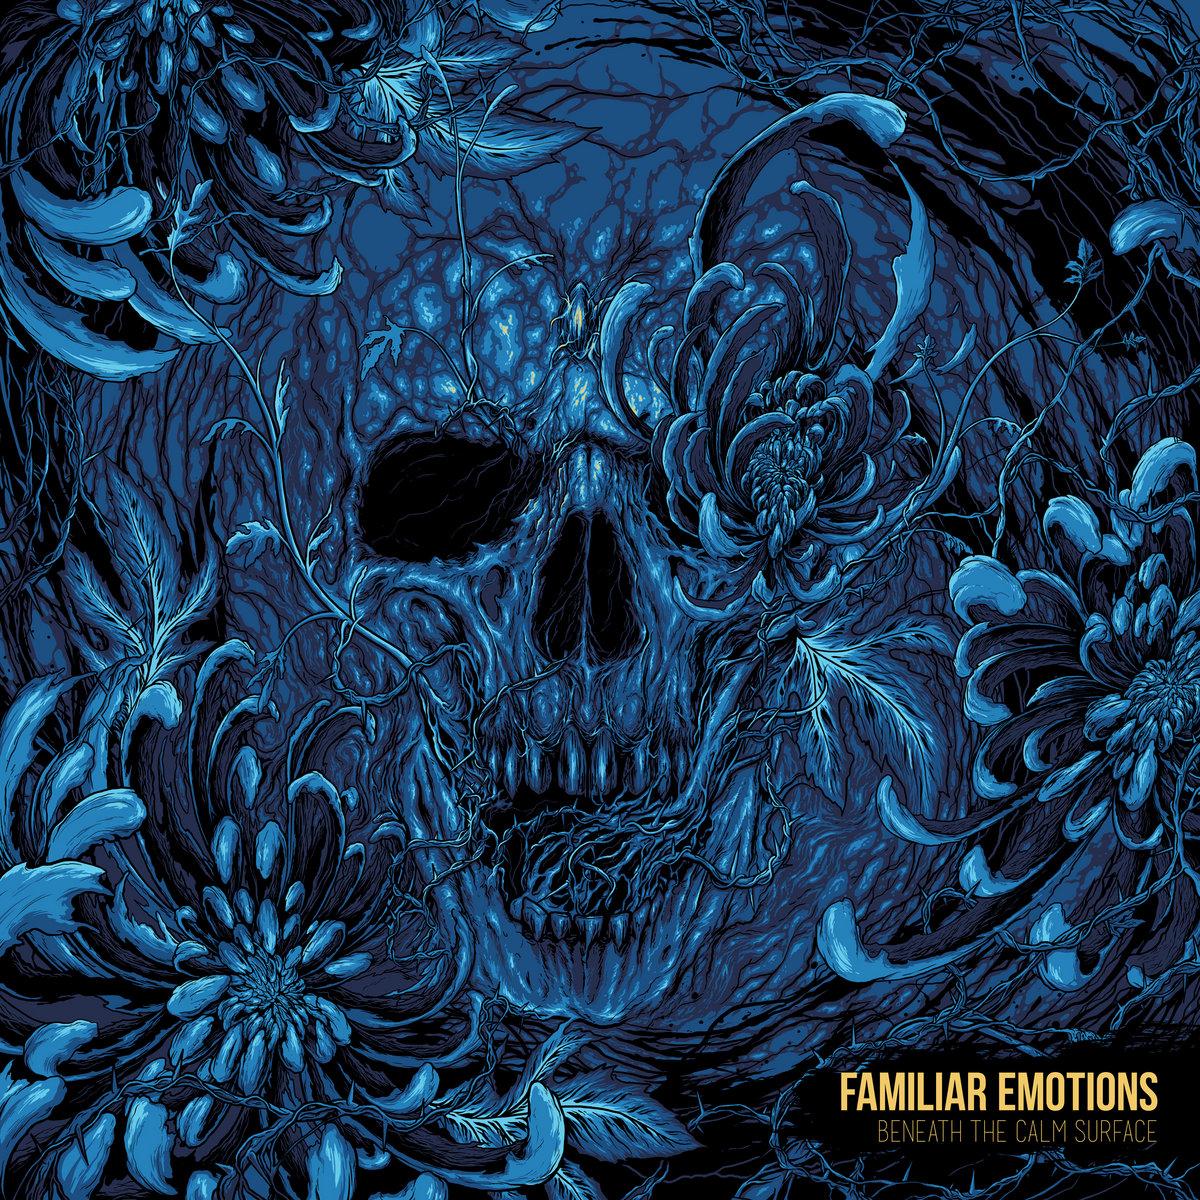 Familiar Emotions - Beneath the Calm Surface (2017)